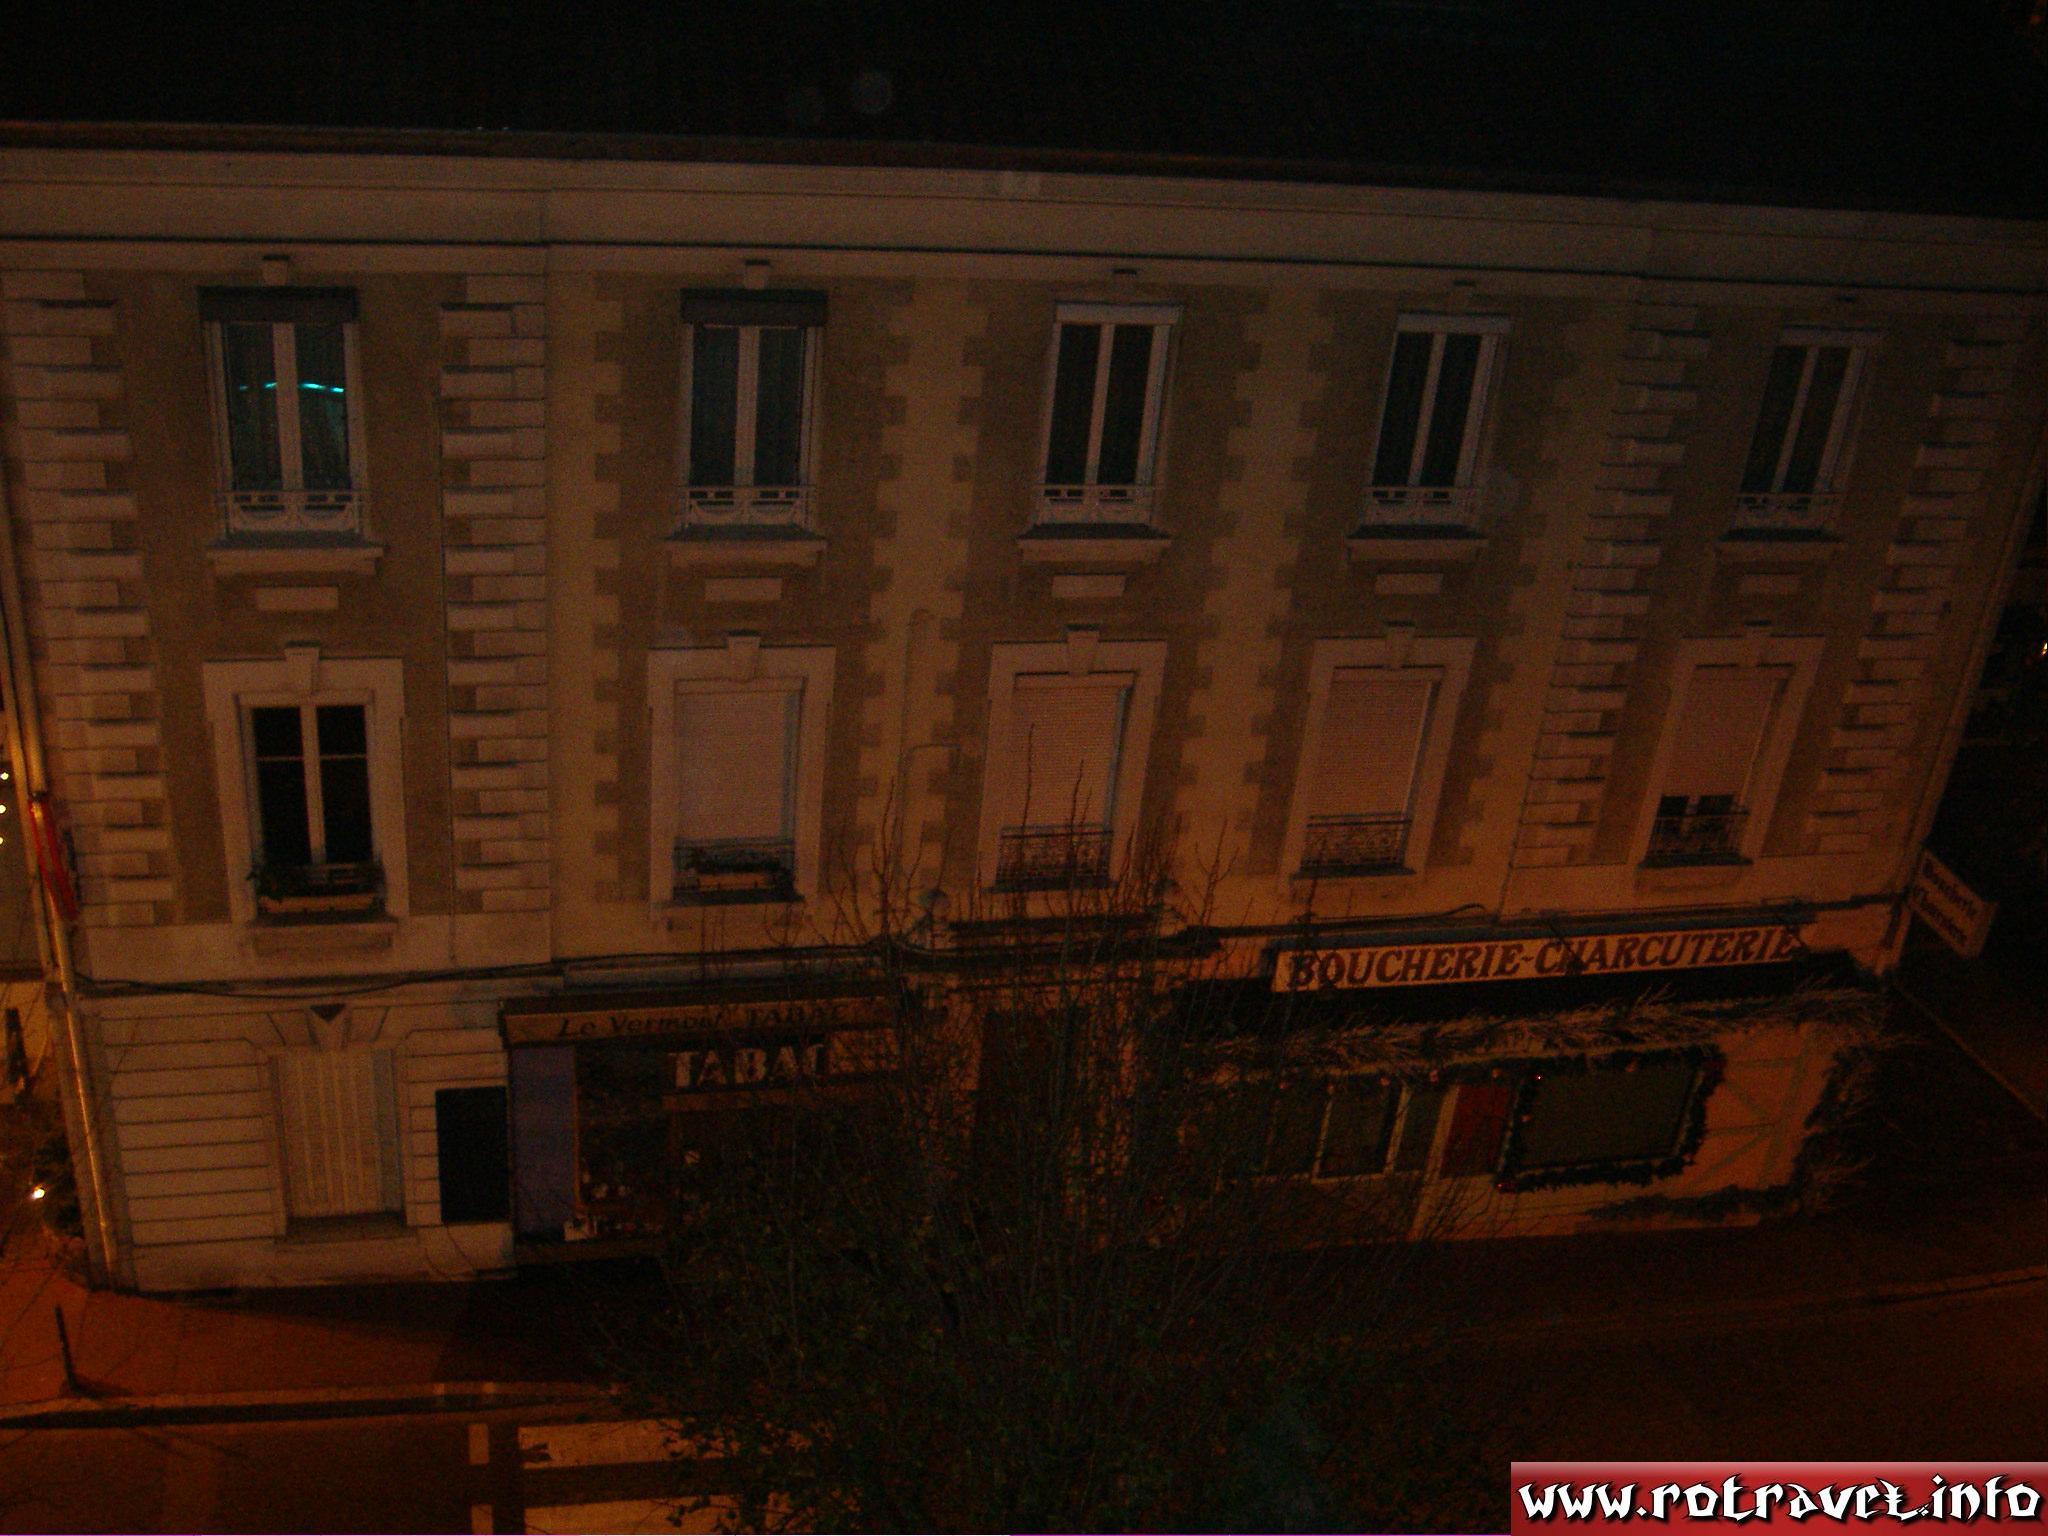 A building with a butcher's shop and charcuterie in Charbonnières-les-Bains